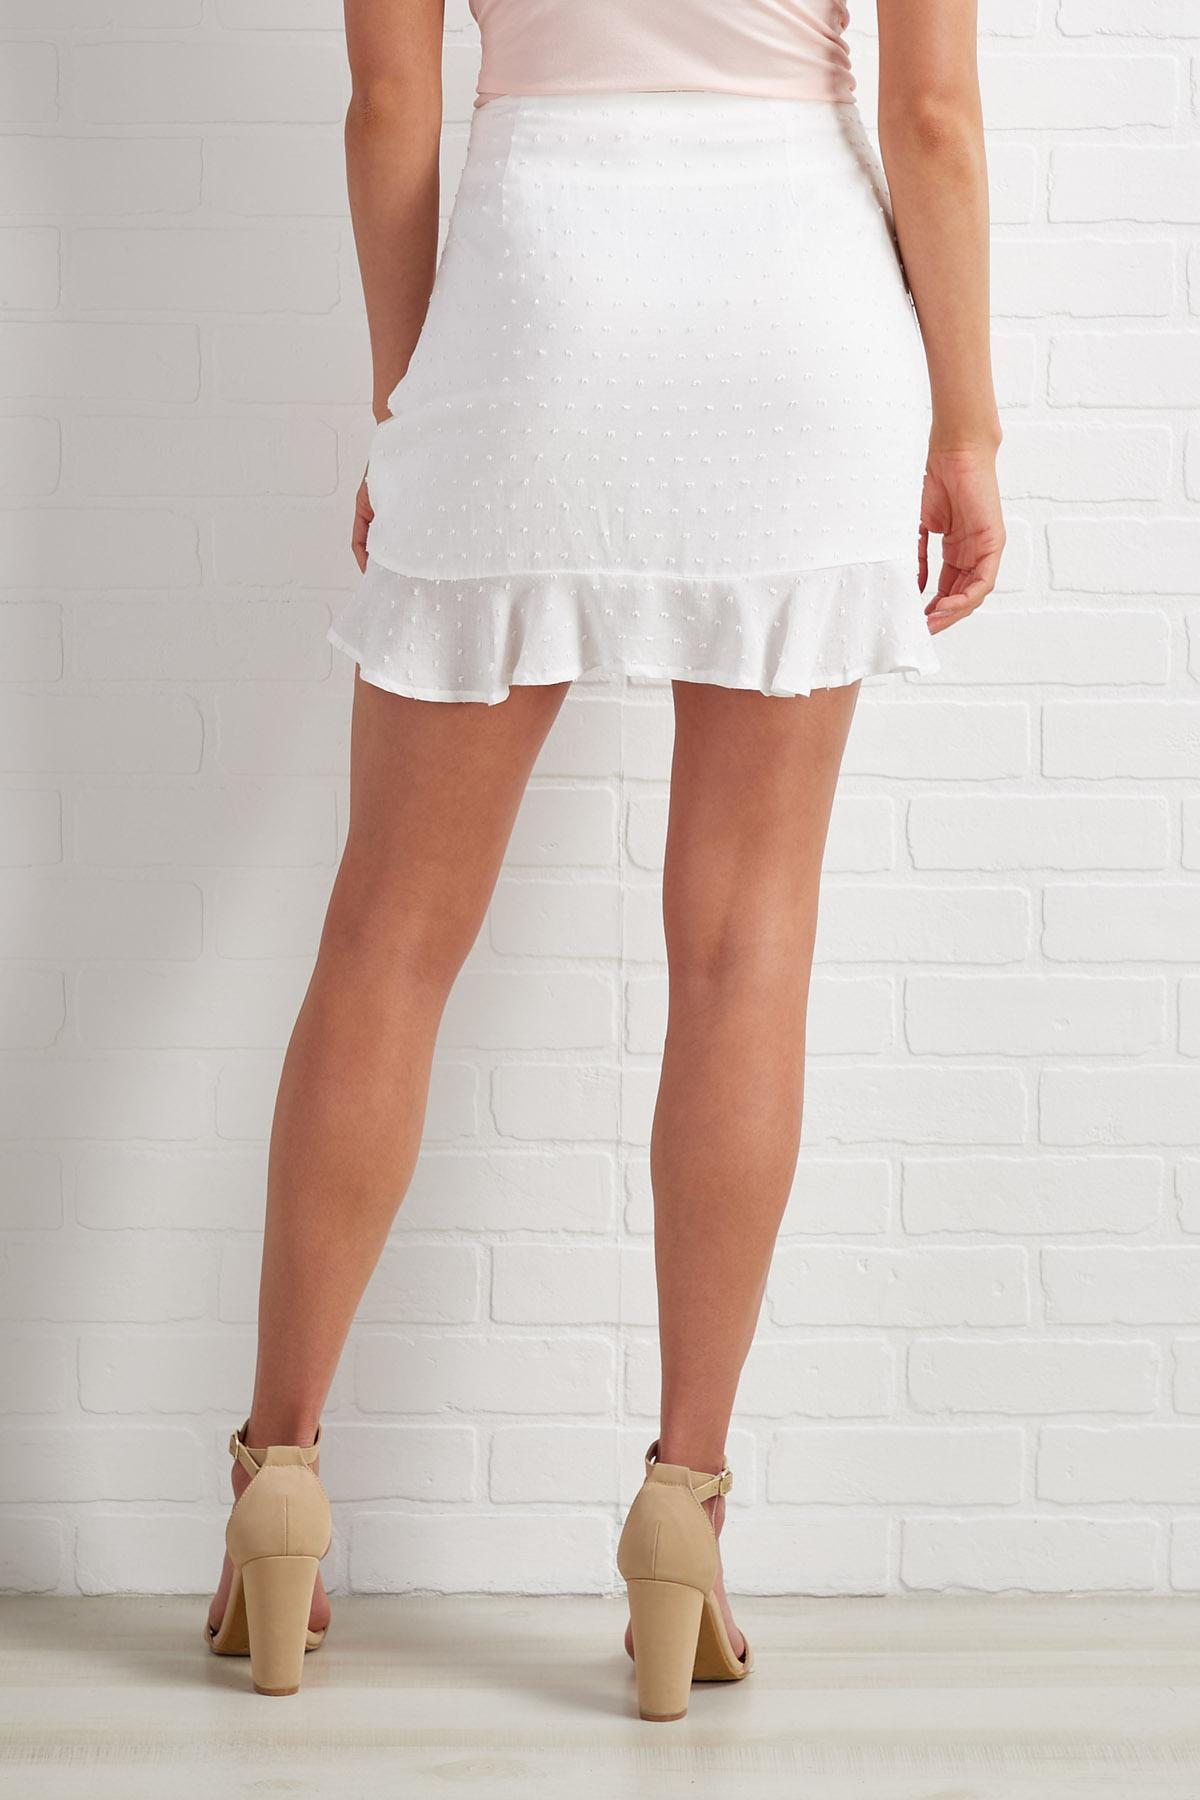 Getting Warmer Skirt